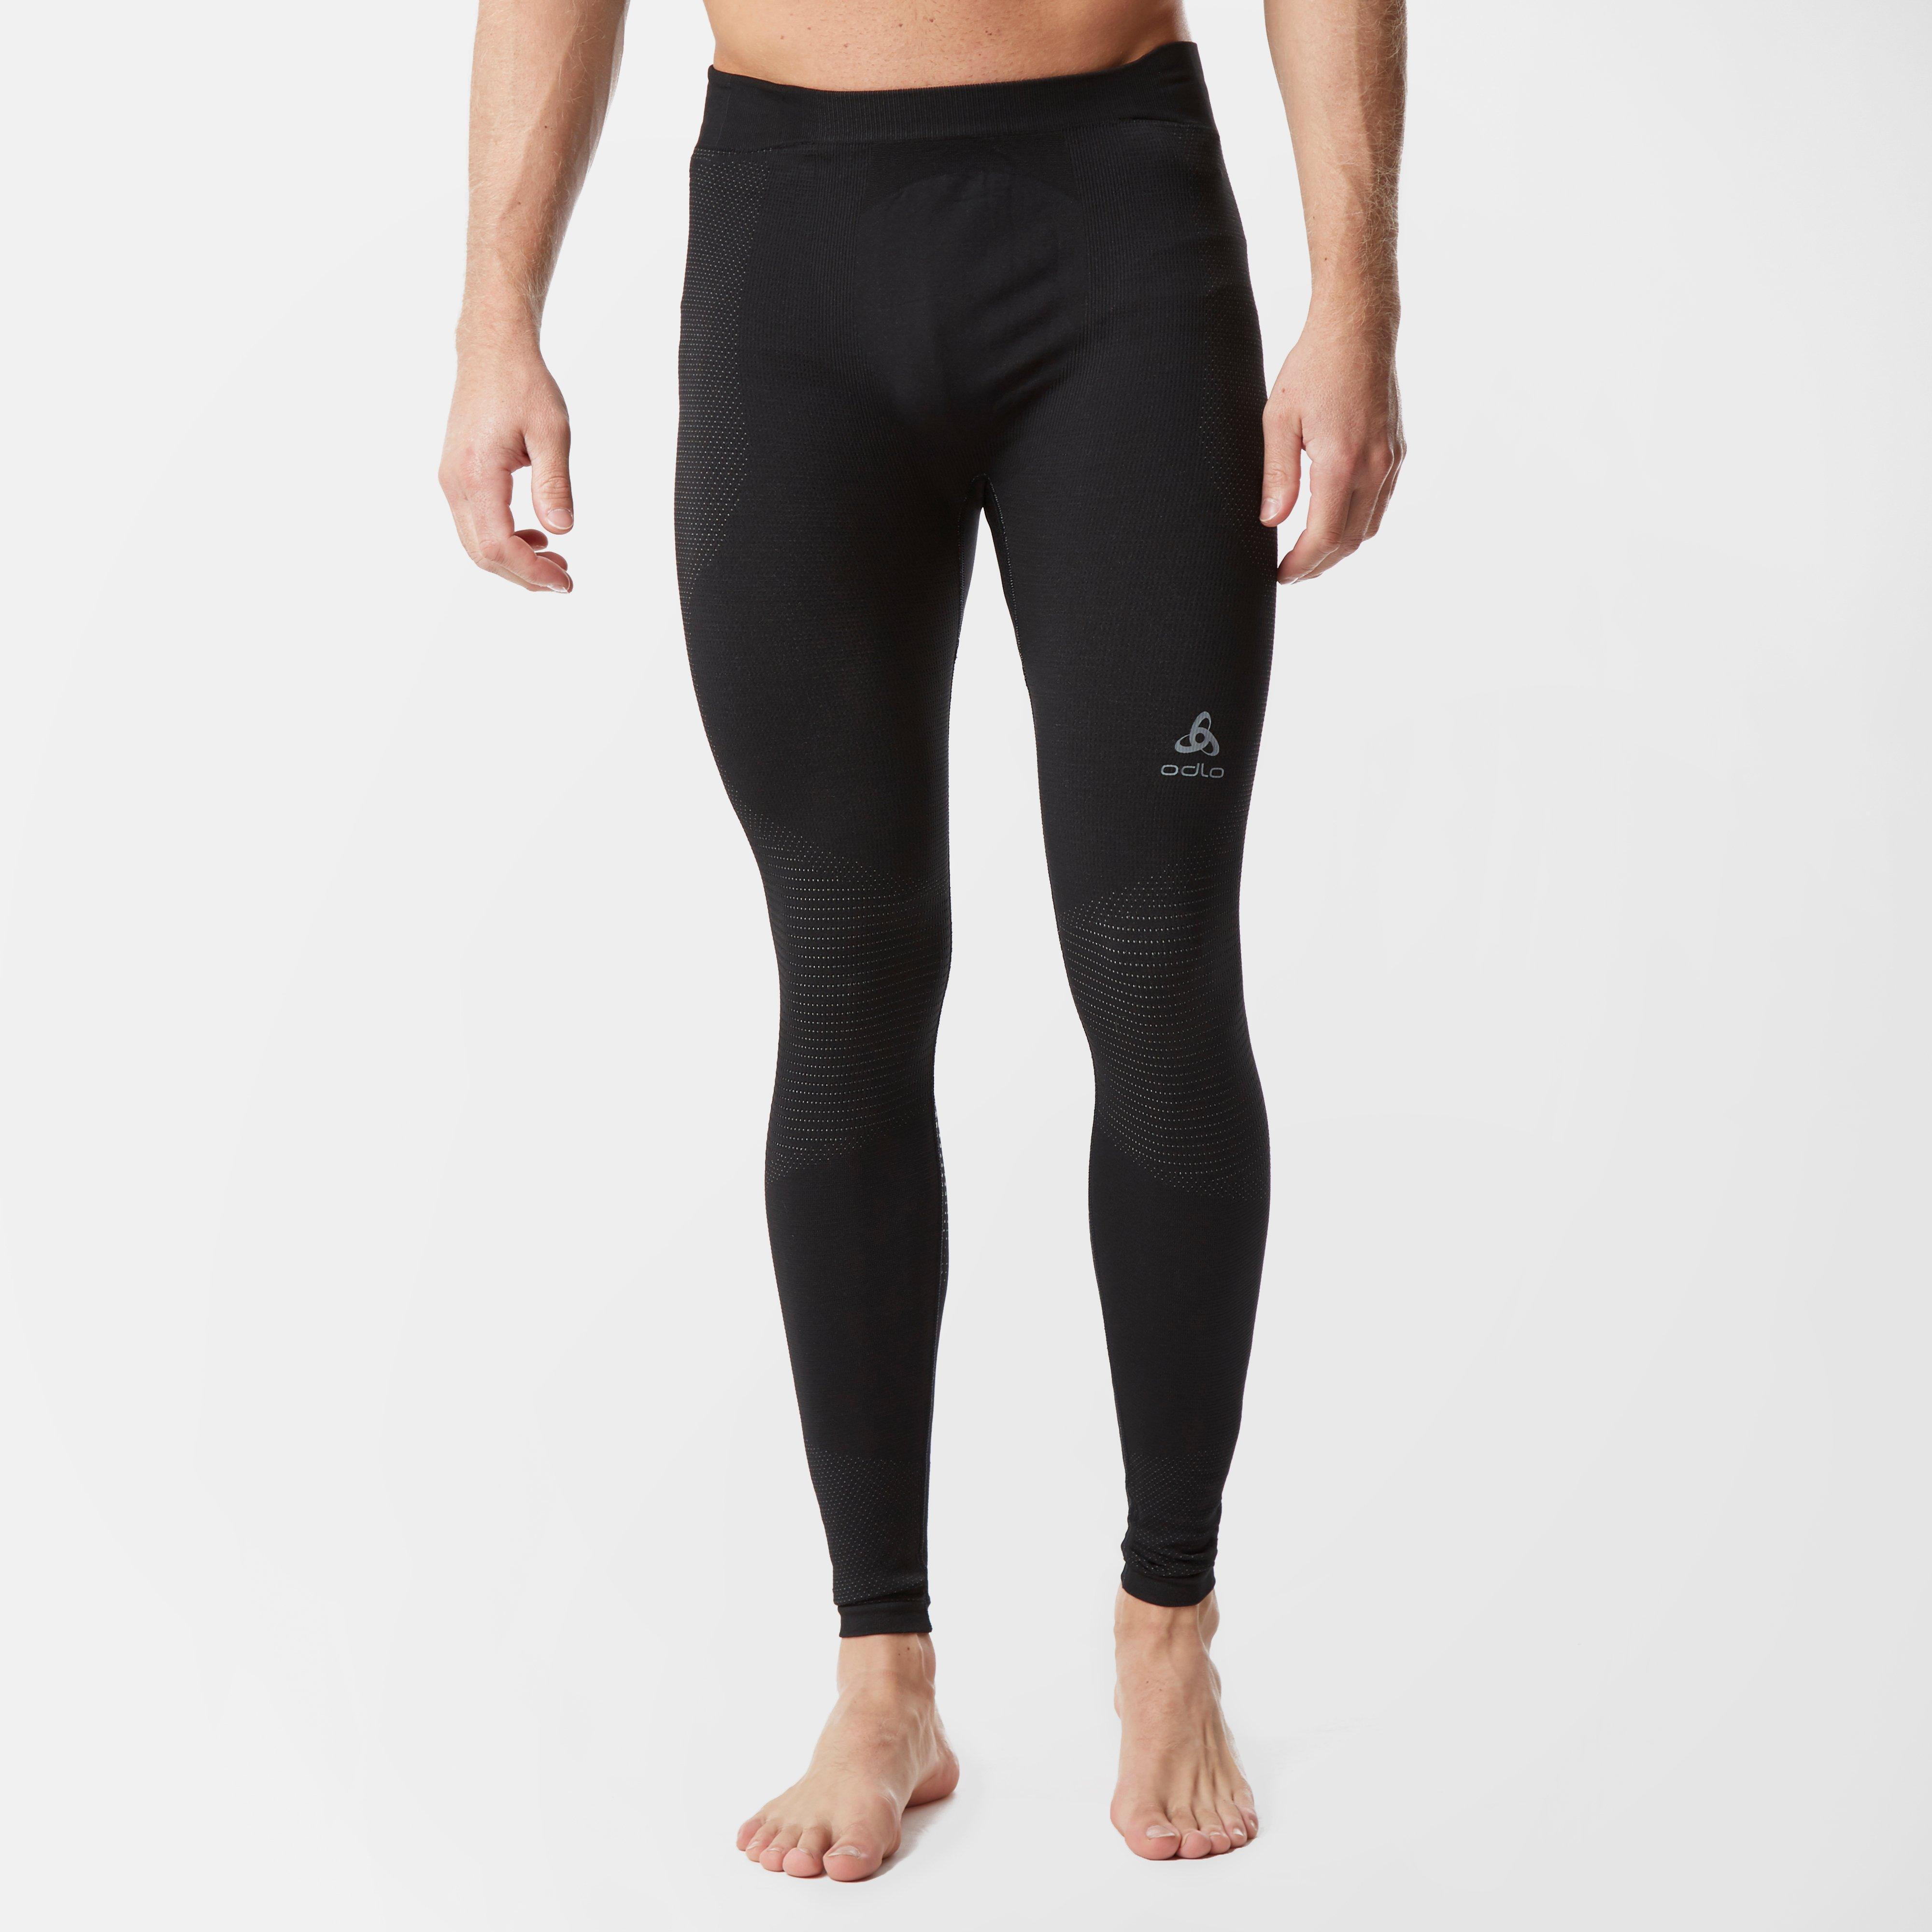 Image of Odlo Men's Suw Performance Warm Pants - Blk/Blk, BLK/BLK